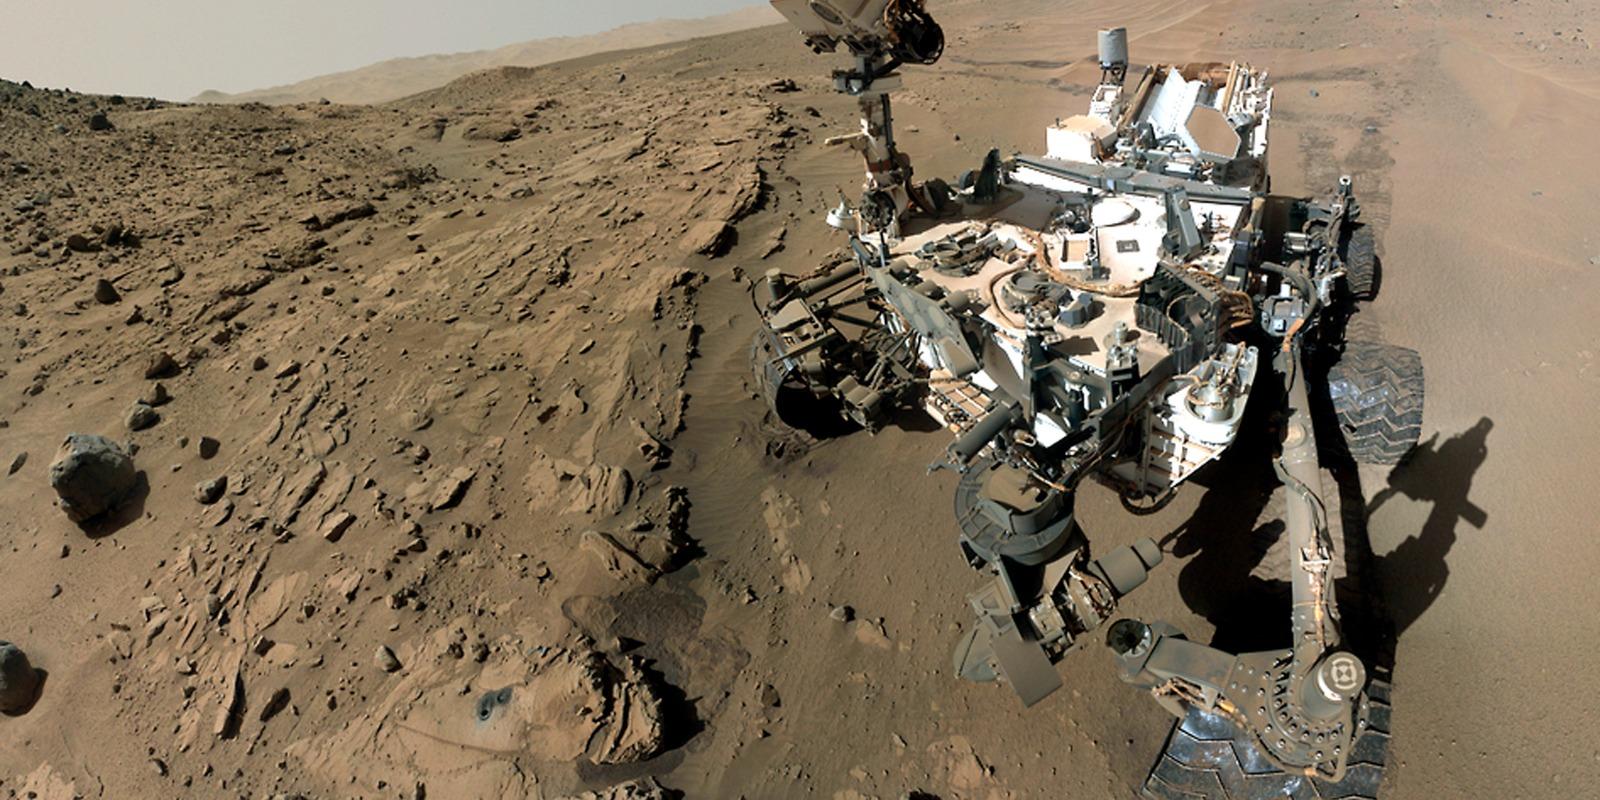 mars rover video - 946×613